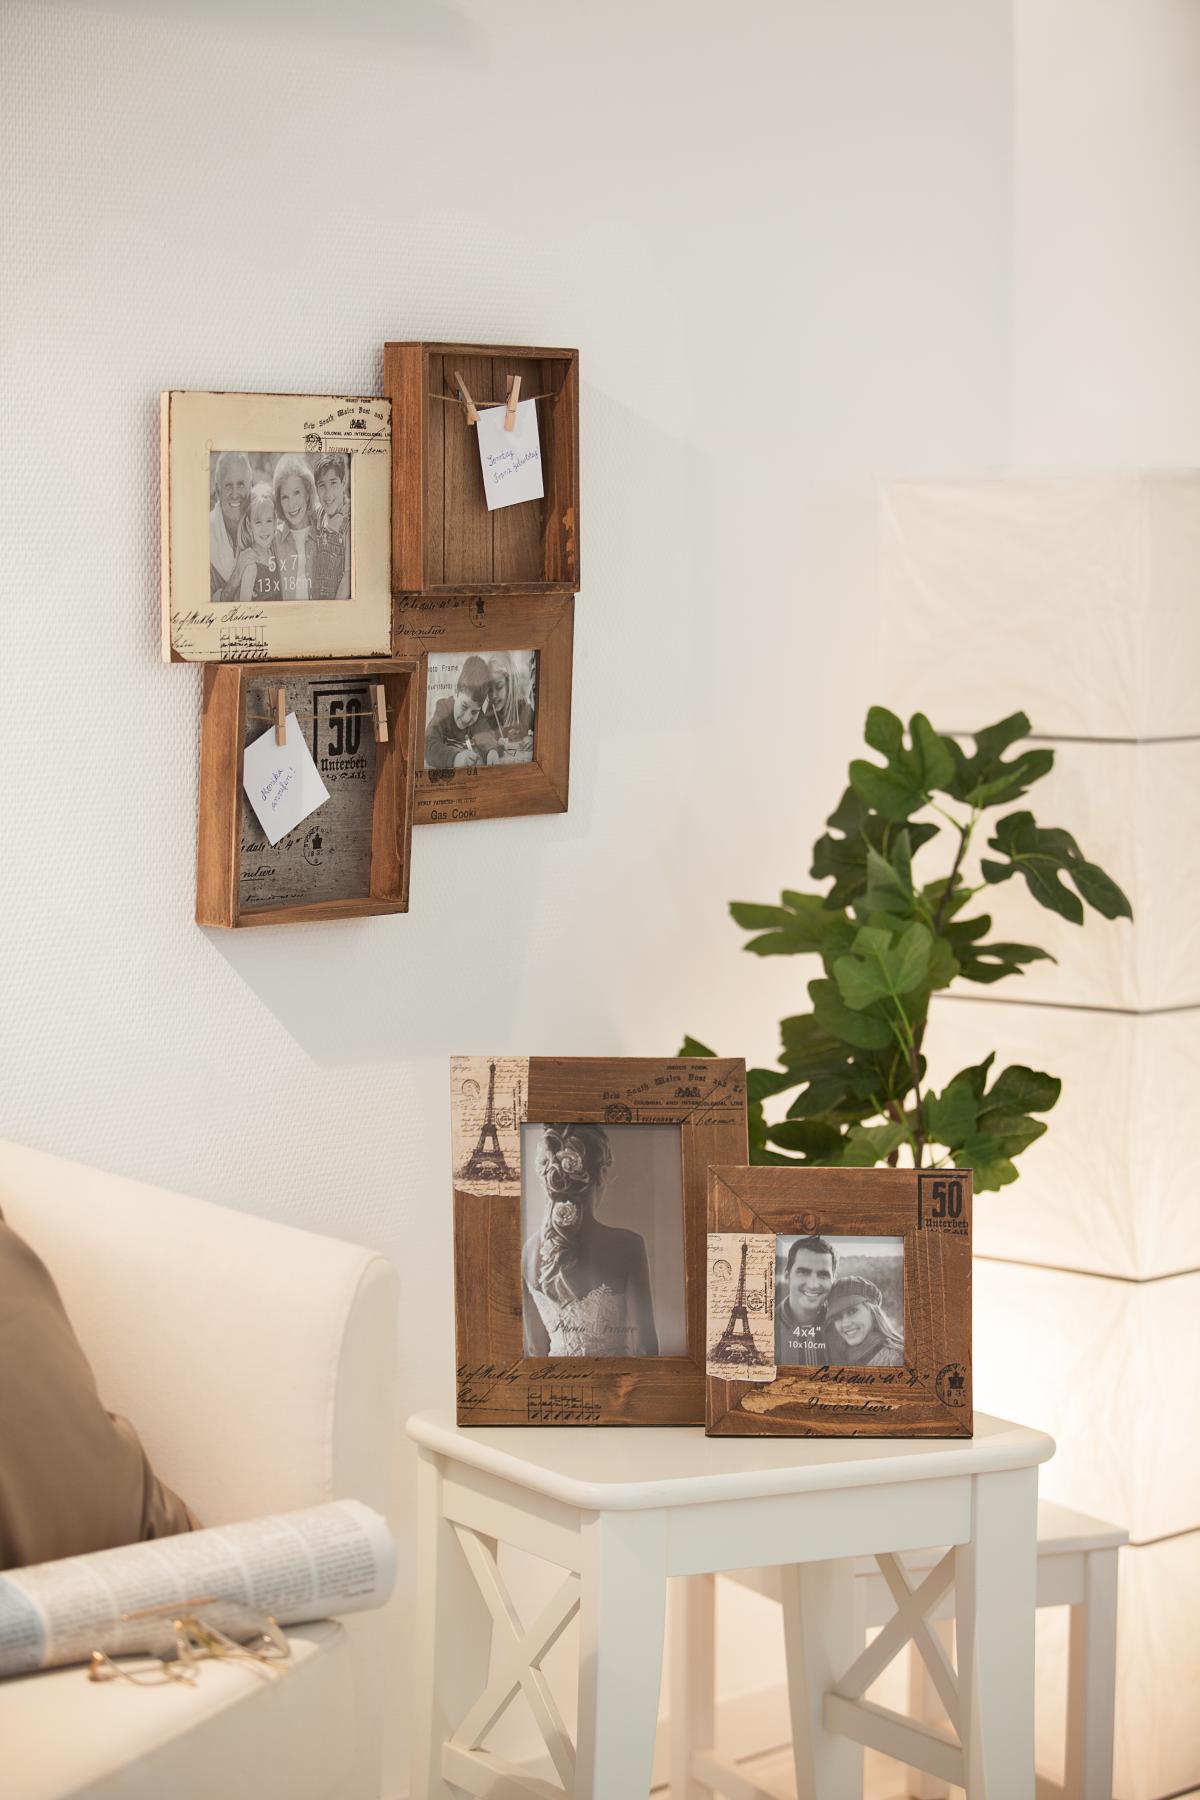 bilderrahmen f r 1 foto 10x10 cm aus holz 19x1 5x19 cm g nstig online kaufen. Black Bedroom Furniture Sets. Home Design Ideas